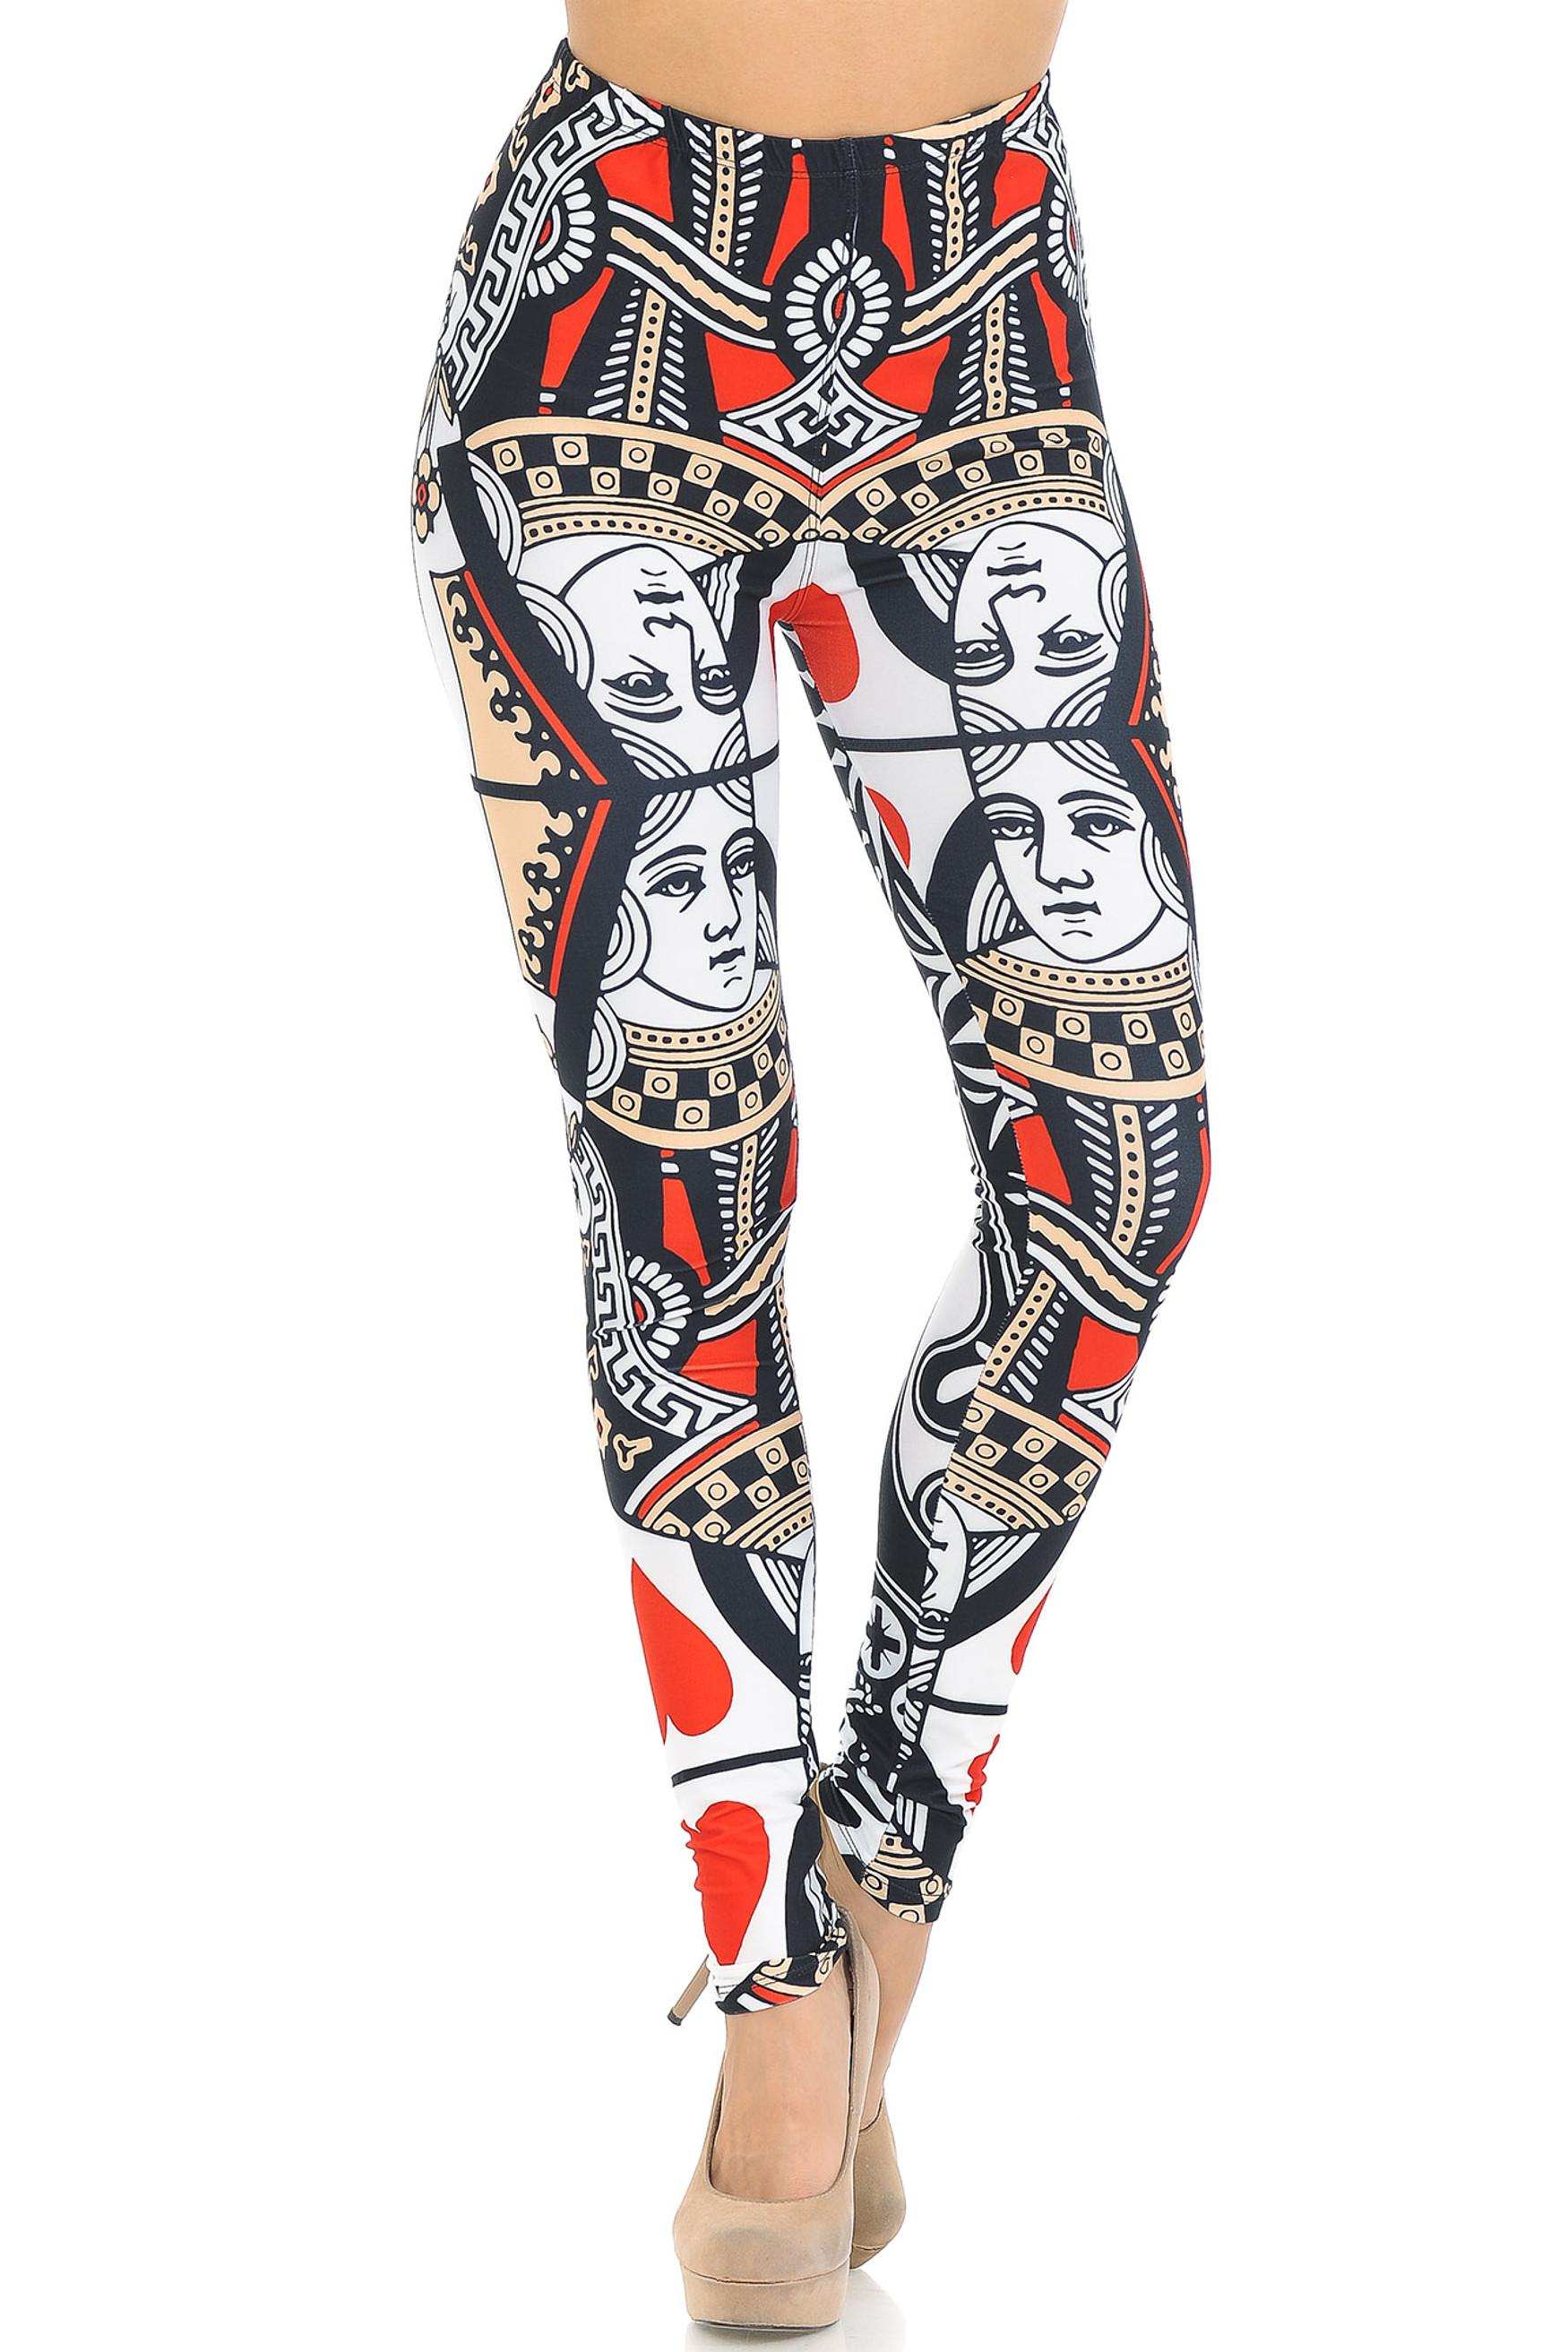 Creamy Soft Queen of Hearts Leggings - USA Fashion™